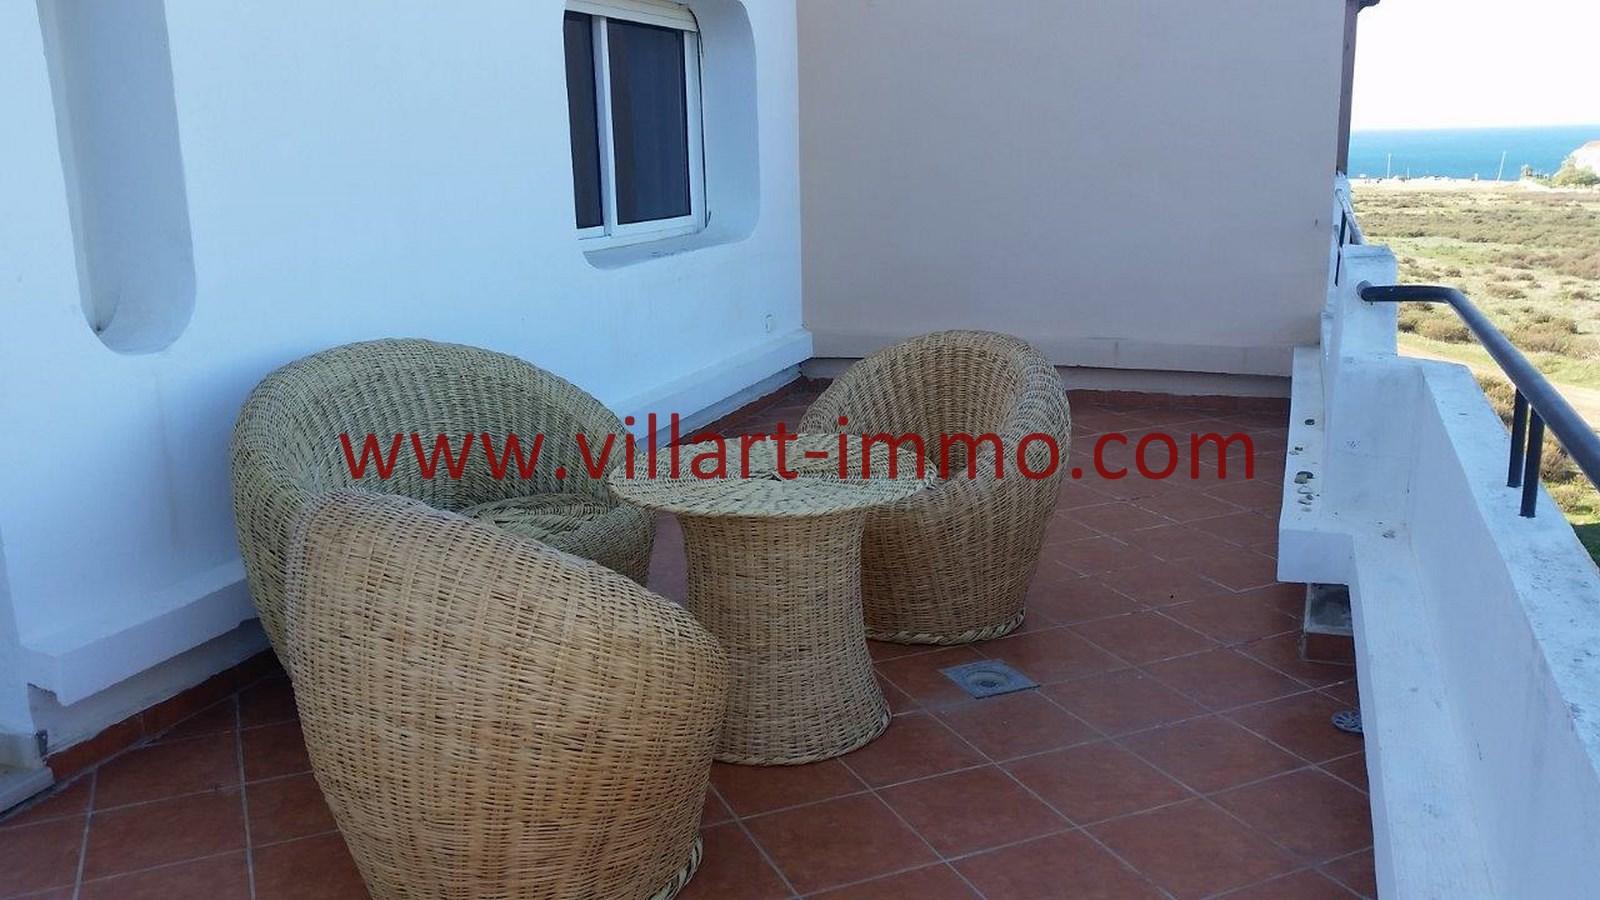 Location appartement meubl tanger avec terrasse zone for Location appartement avec terrasse